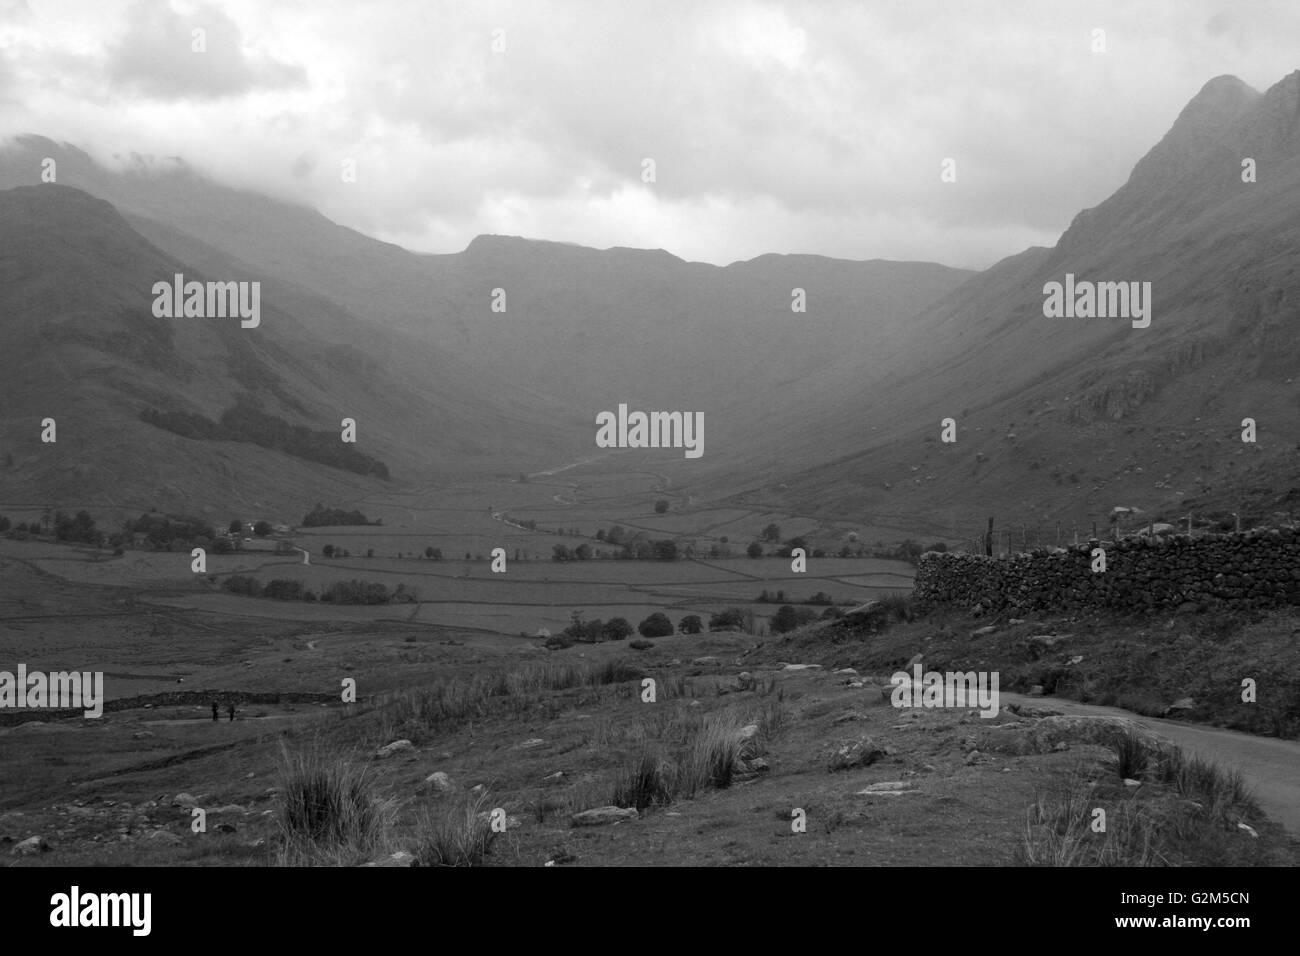 Langdale Pikes between Wrynose and Lingmoor Fells - Stock Image